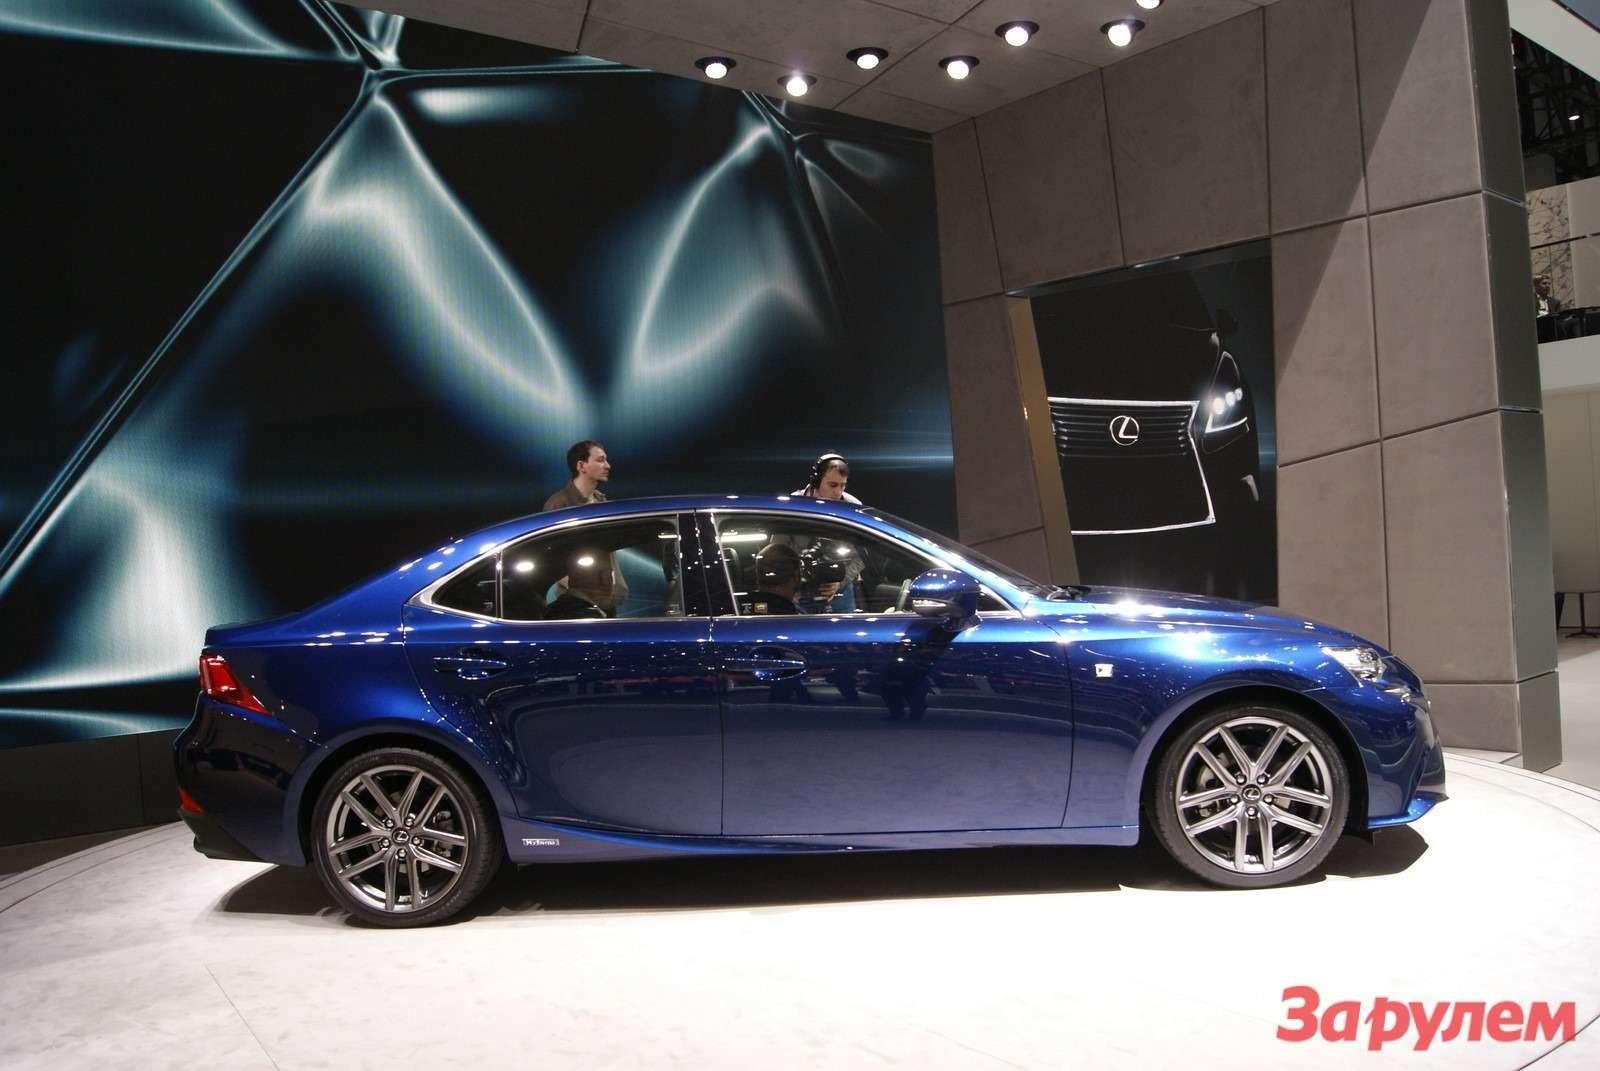 Lexus_iS300_hybrid_7